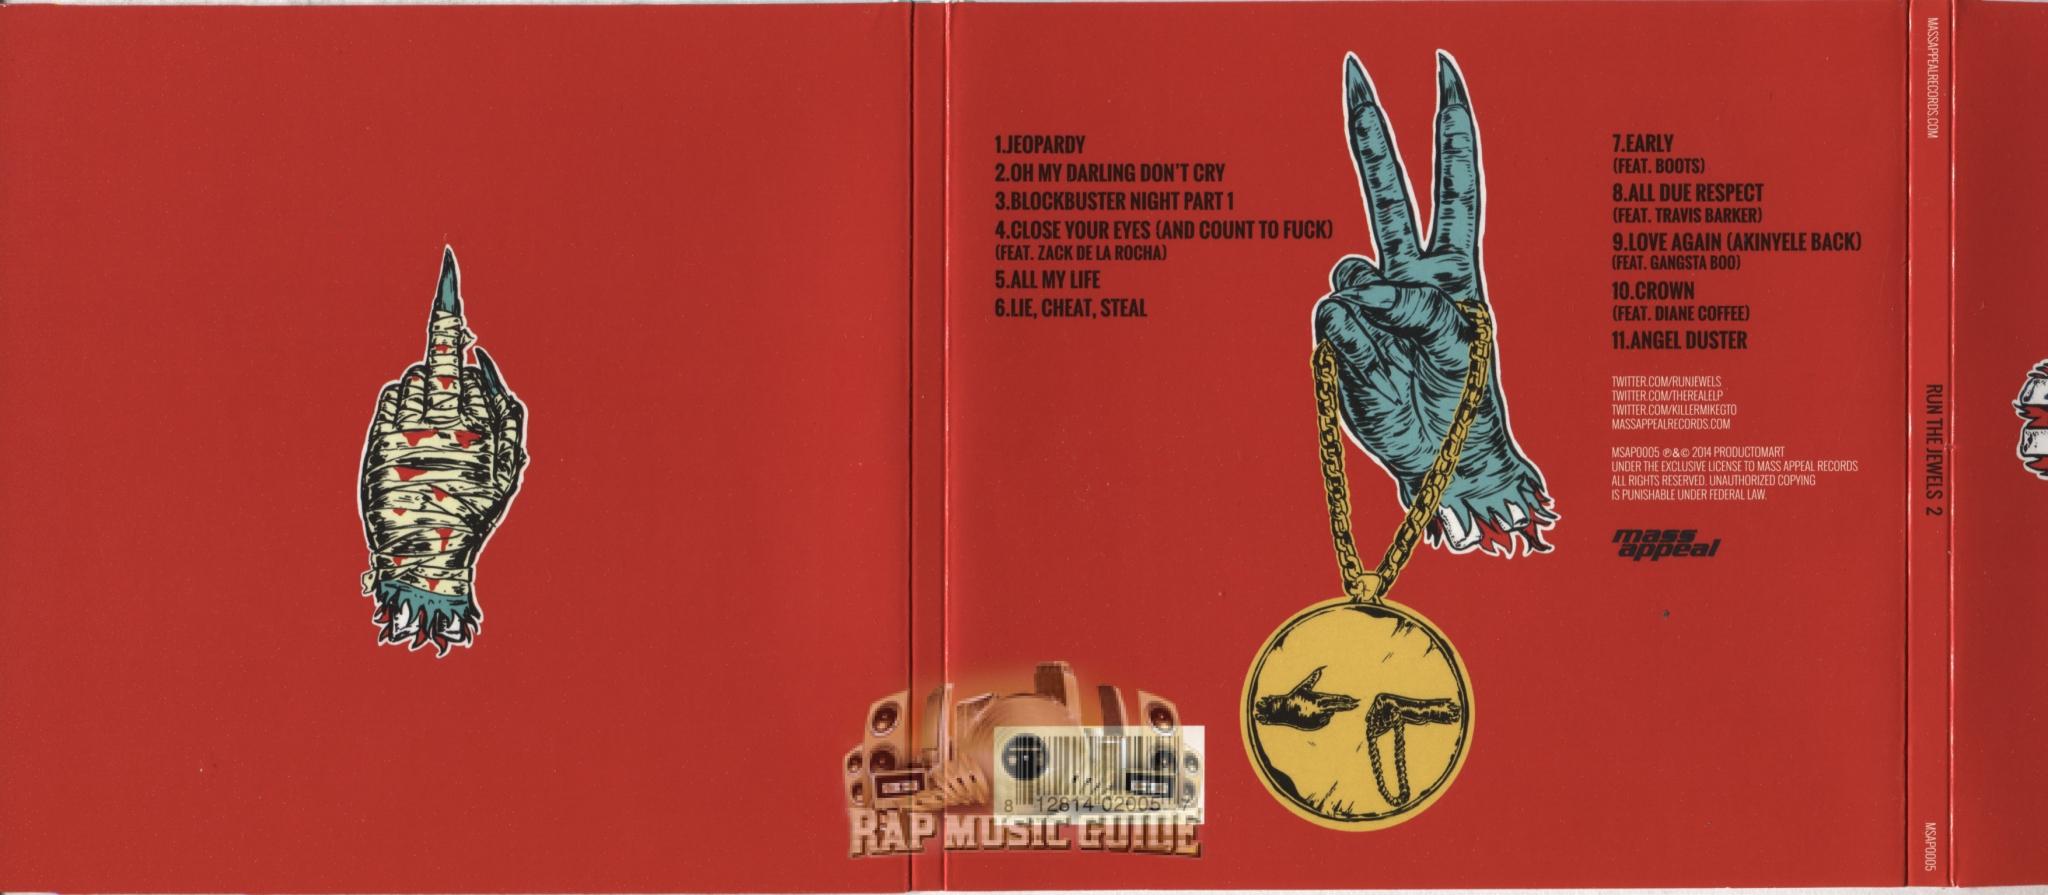 Run The Jewels - Run The Jewels 2: CD | Rap Music Guide